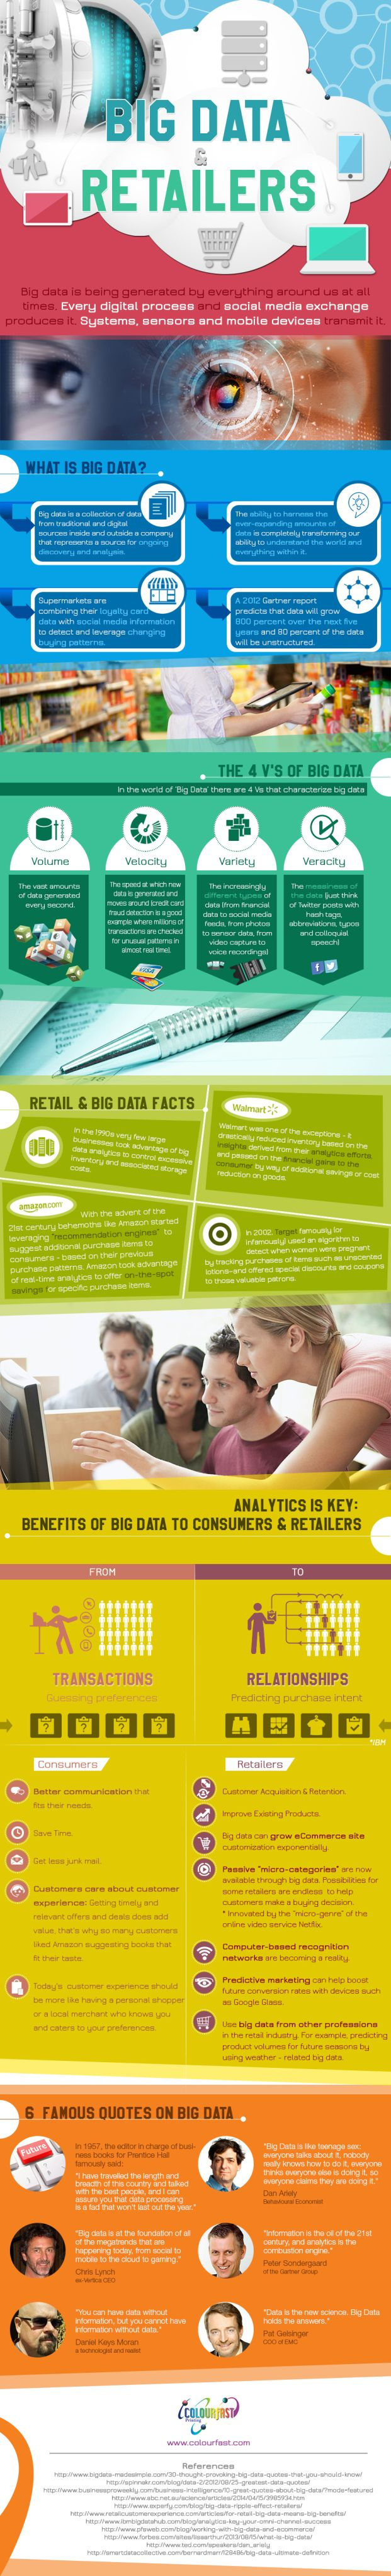 www.datasciencece...